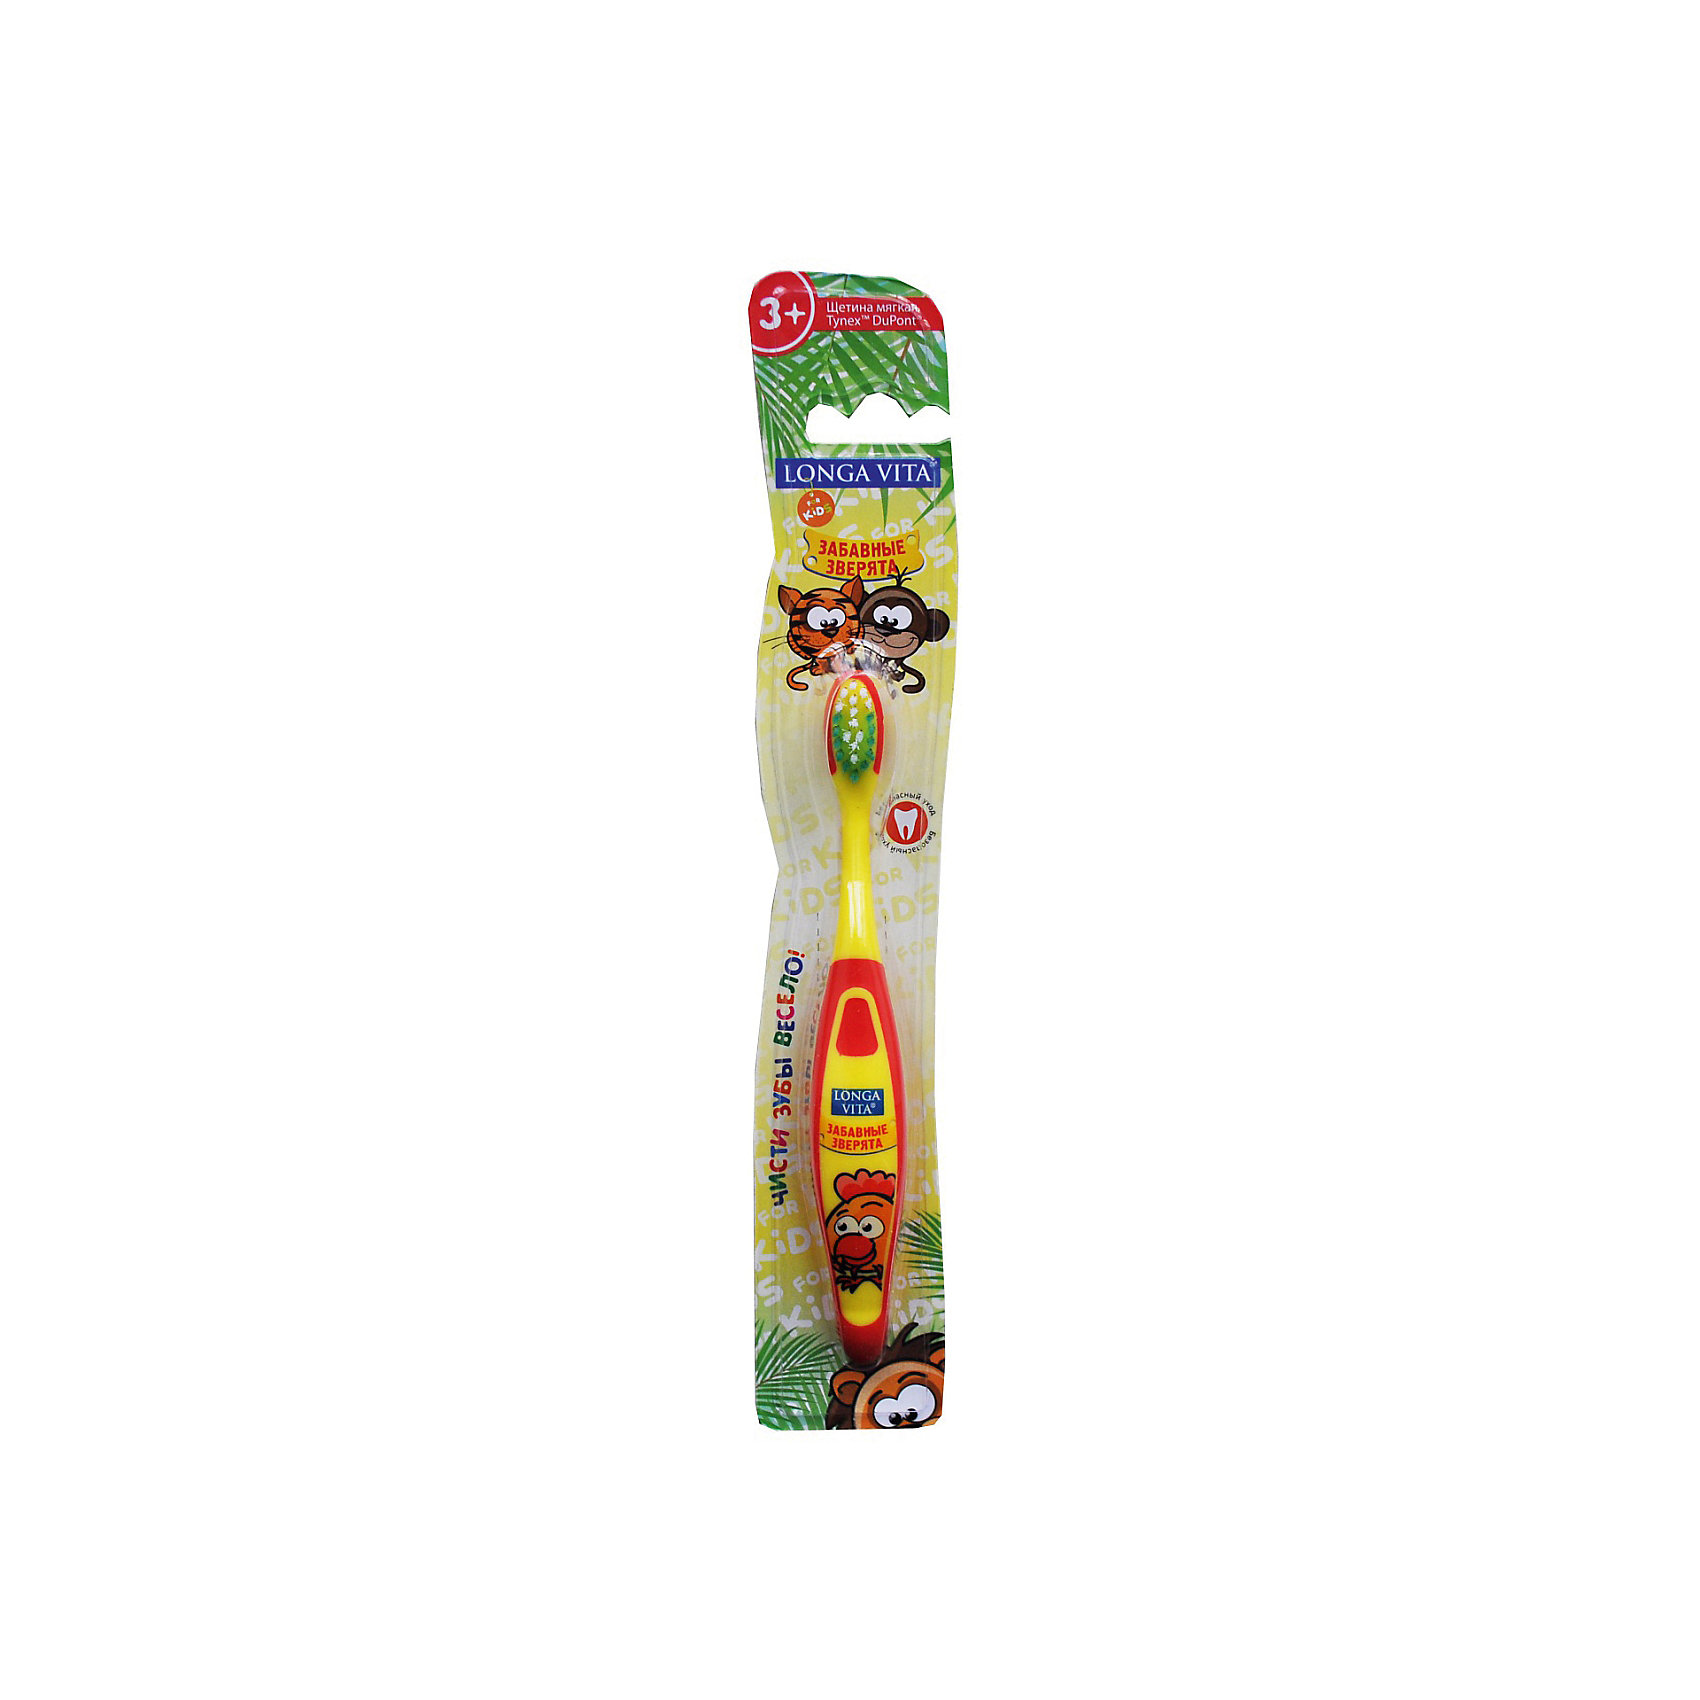 Детская зубная щетка Забавные зверята, от 3-х лет, арт. S-151, LONGA VITA, желтый